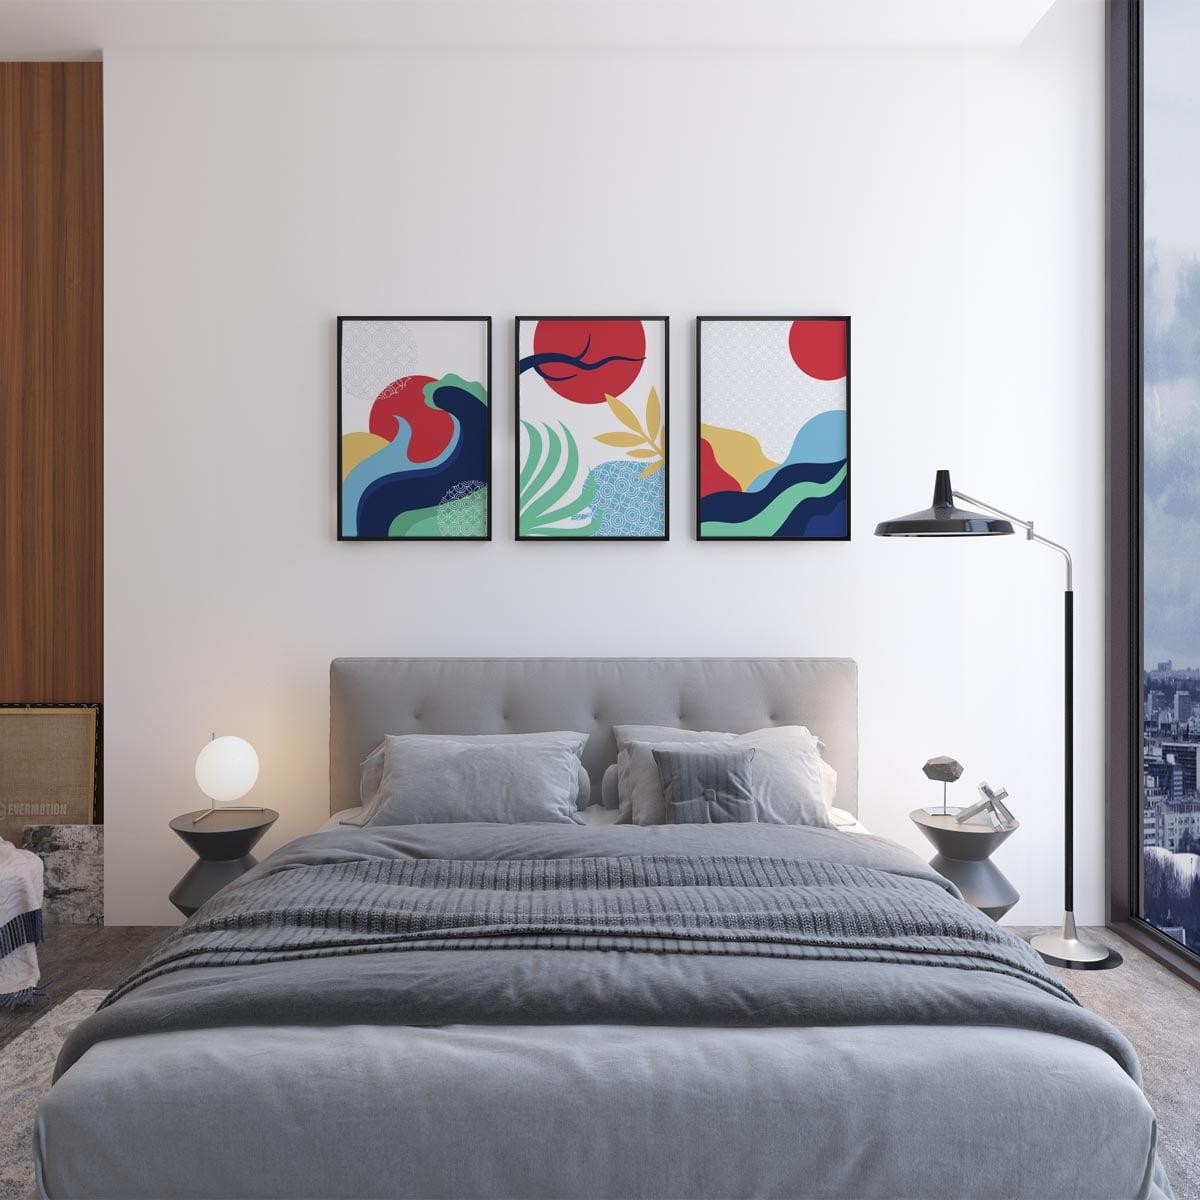 Kit De Quadros Decorativos Quarto Sala Minimalista Paisagem Abstrata